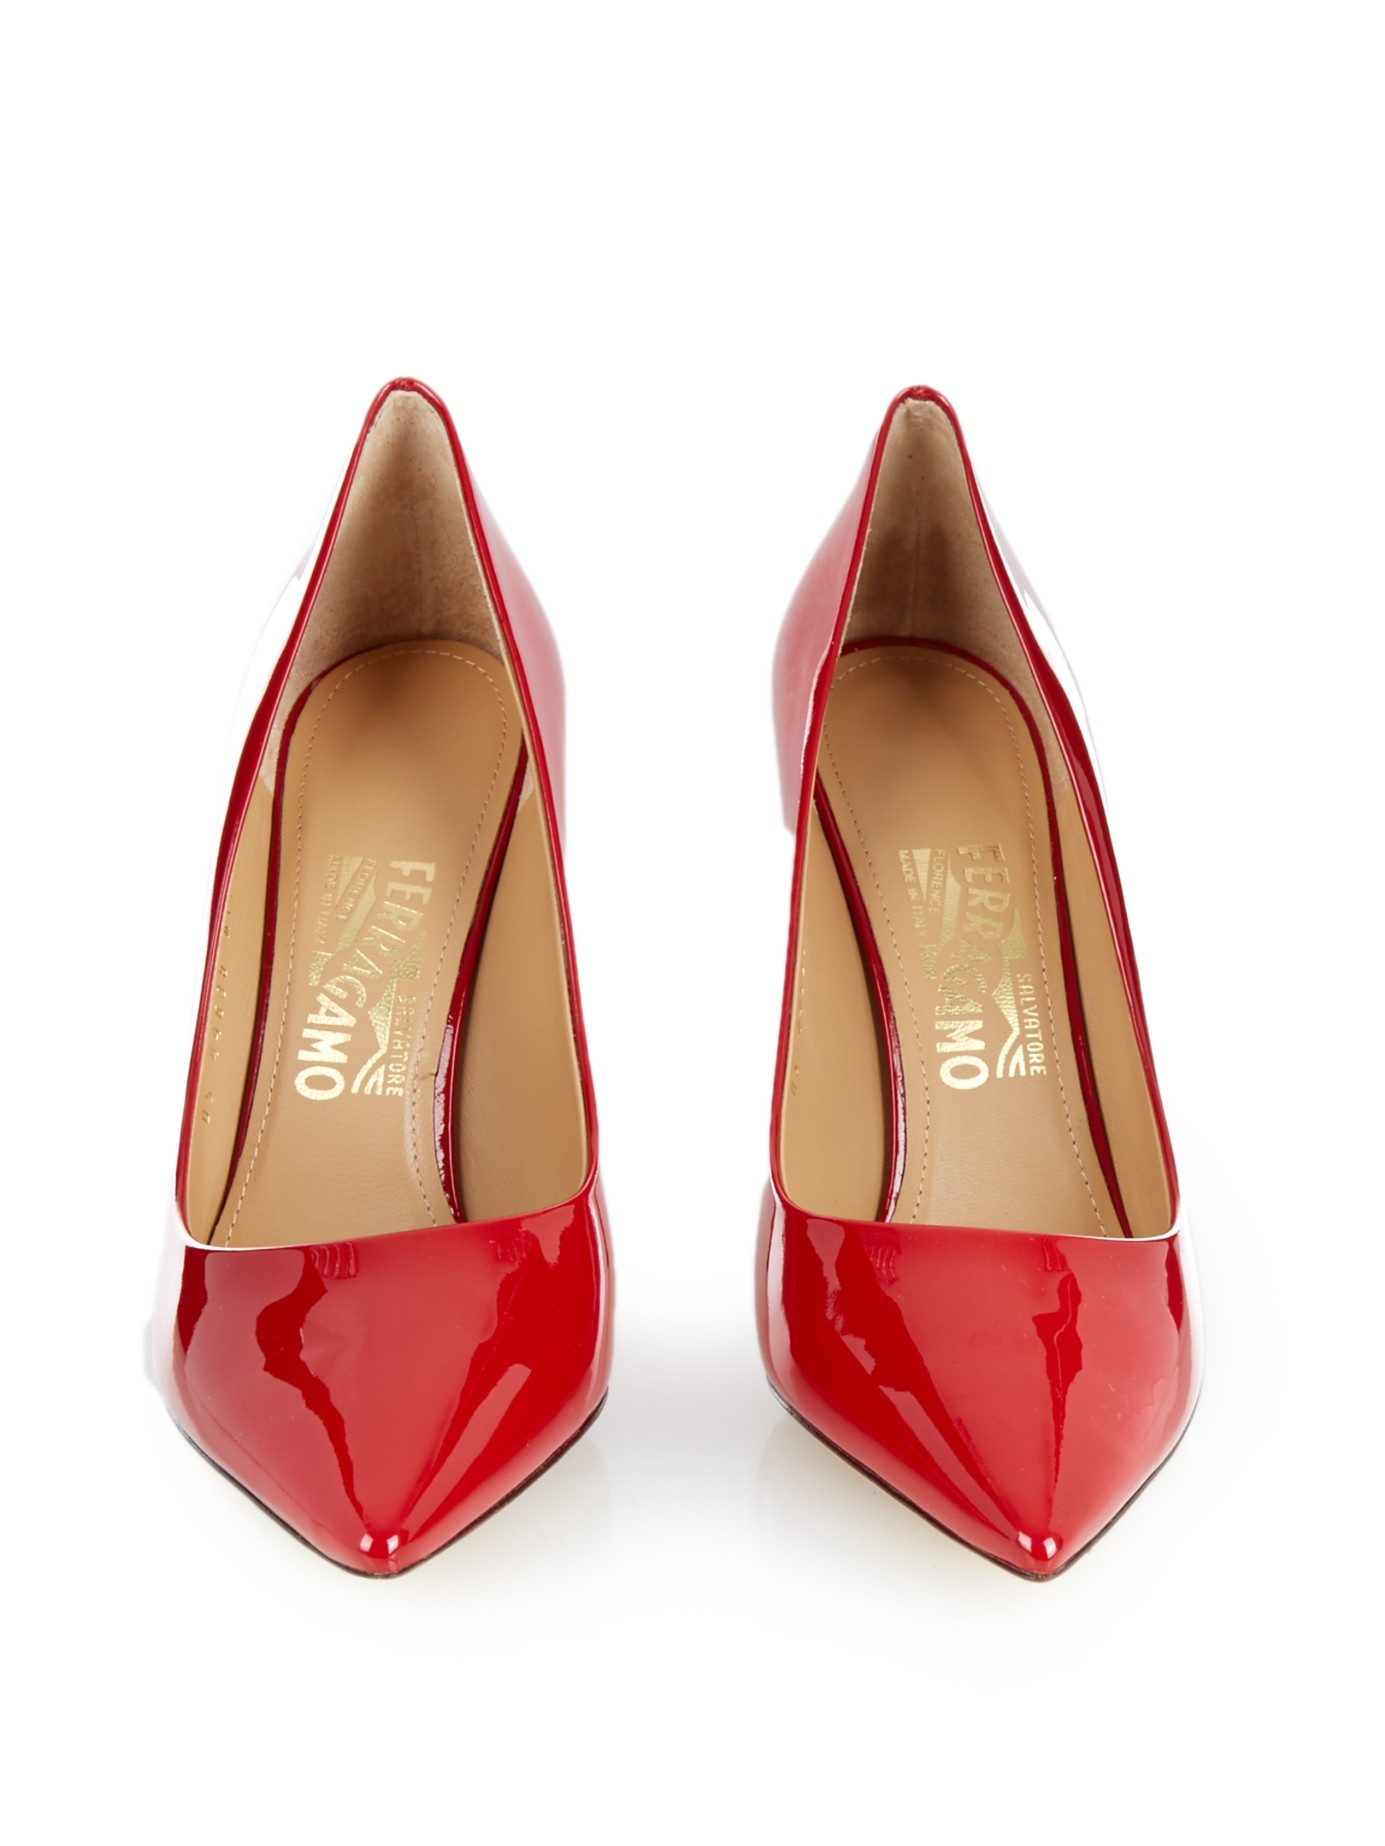 6d43d8ab67b46 Lyst - Ferragamo Susi Patent Leather Pumps in Red